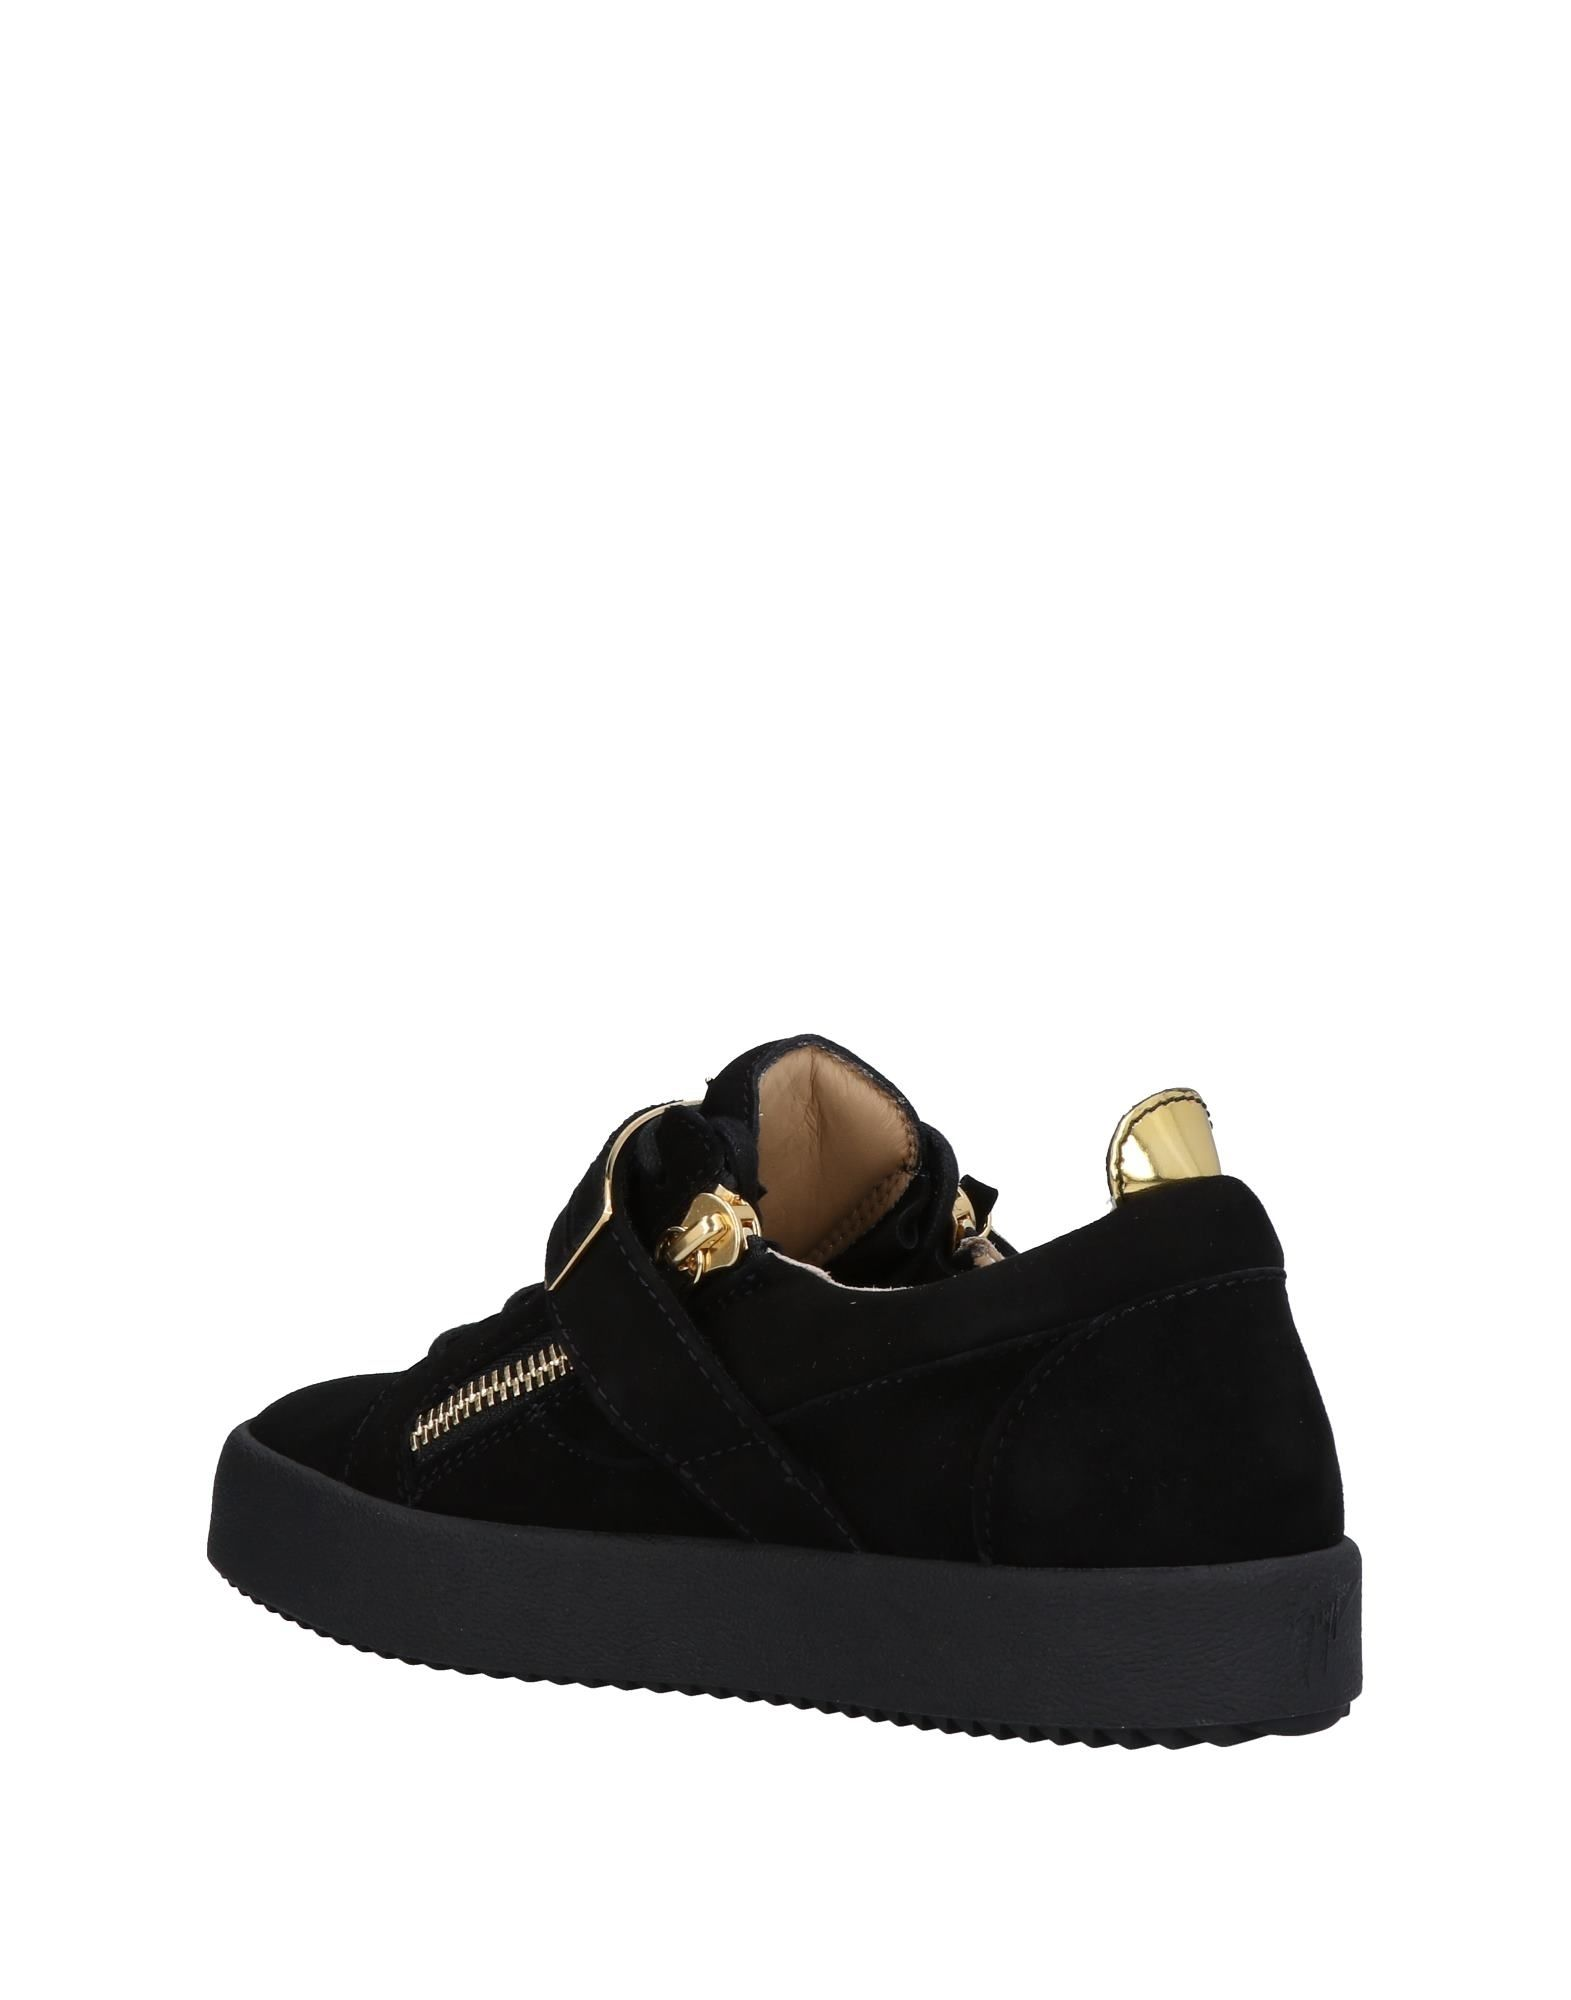 Giuseppe Zanotti Sneakers Damen Schuhe  11459243ONGünstige gut aussehende Schuhe Damen 676cc9